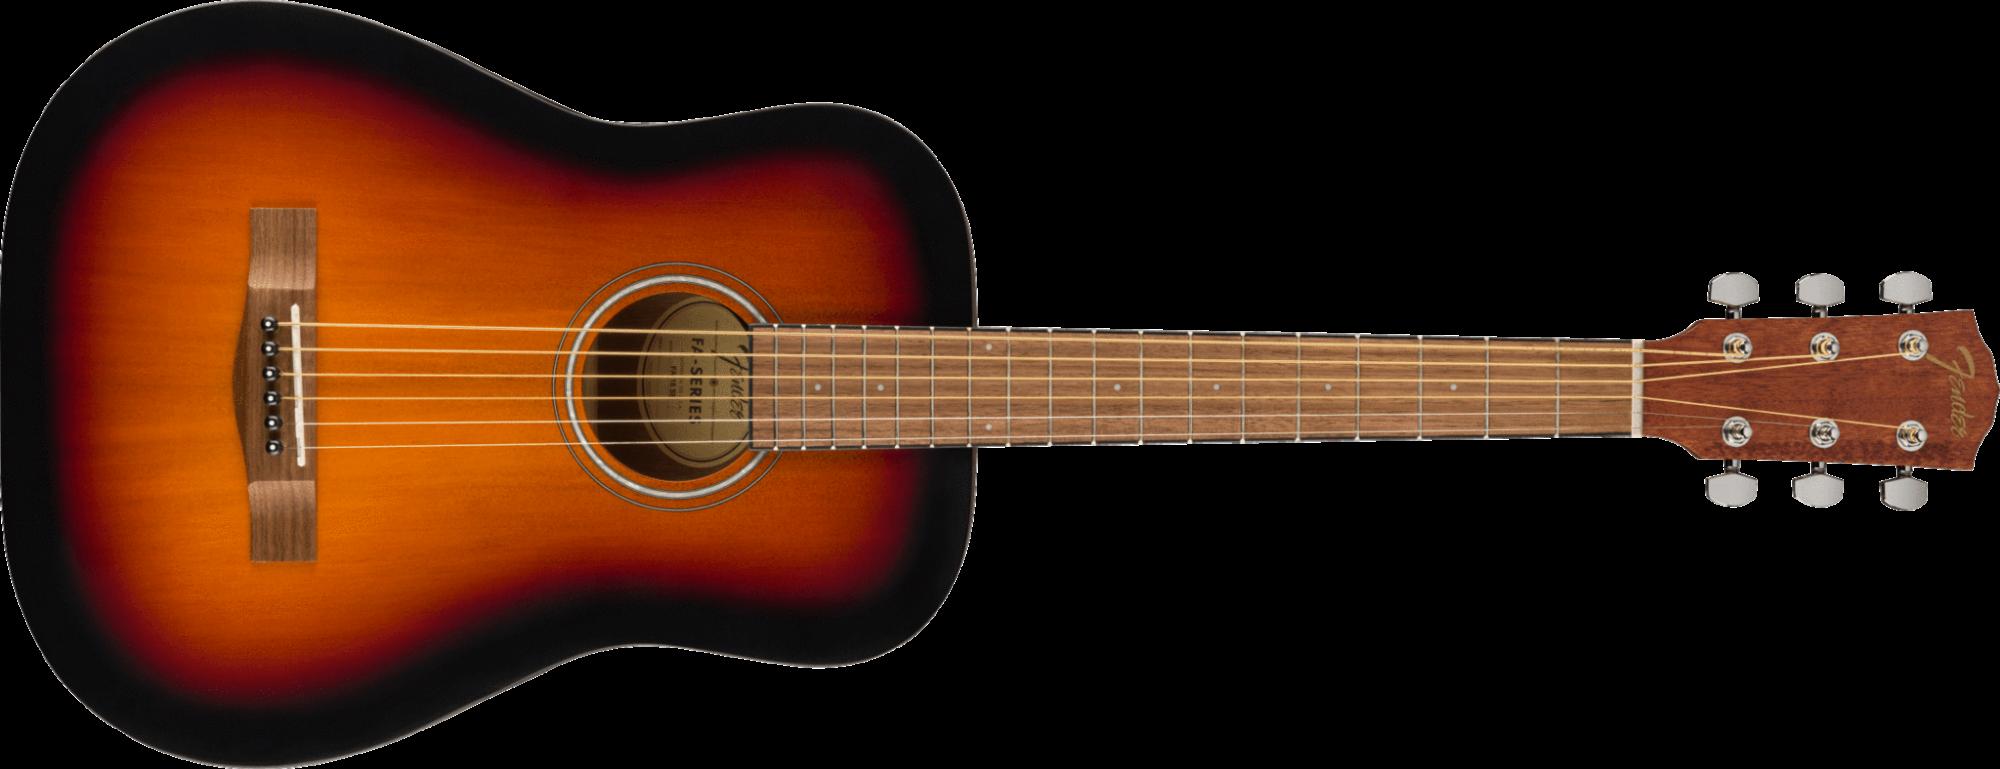 Fender FA-15 3/4 Acoustic Guitar w/Gig Bag, Walnut Fingerboard, Sunburst